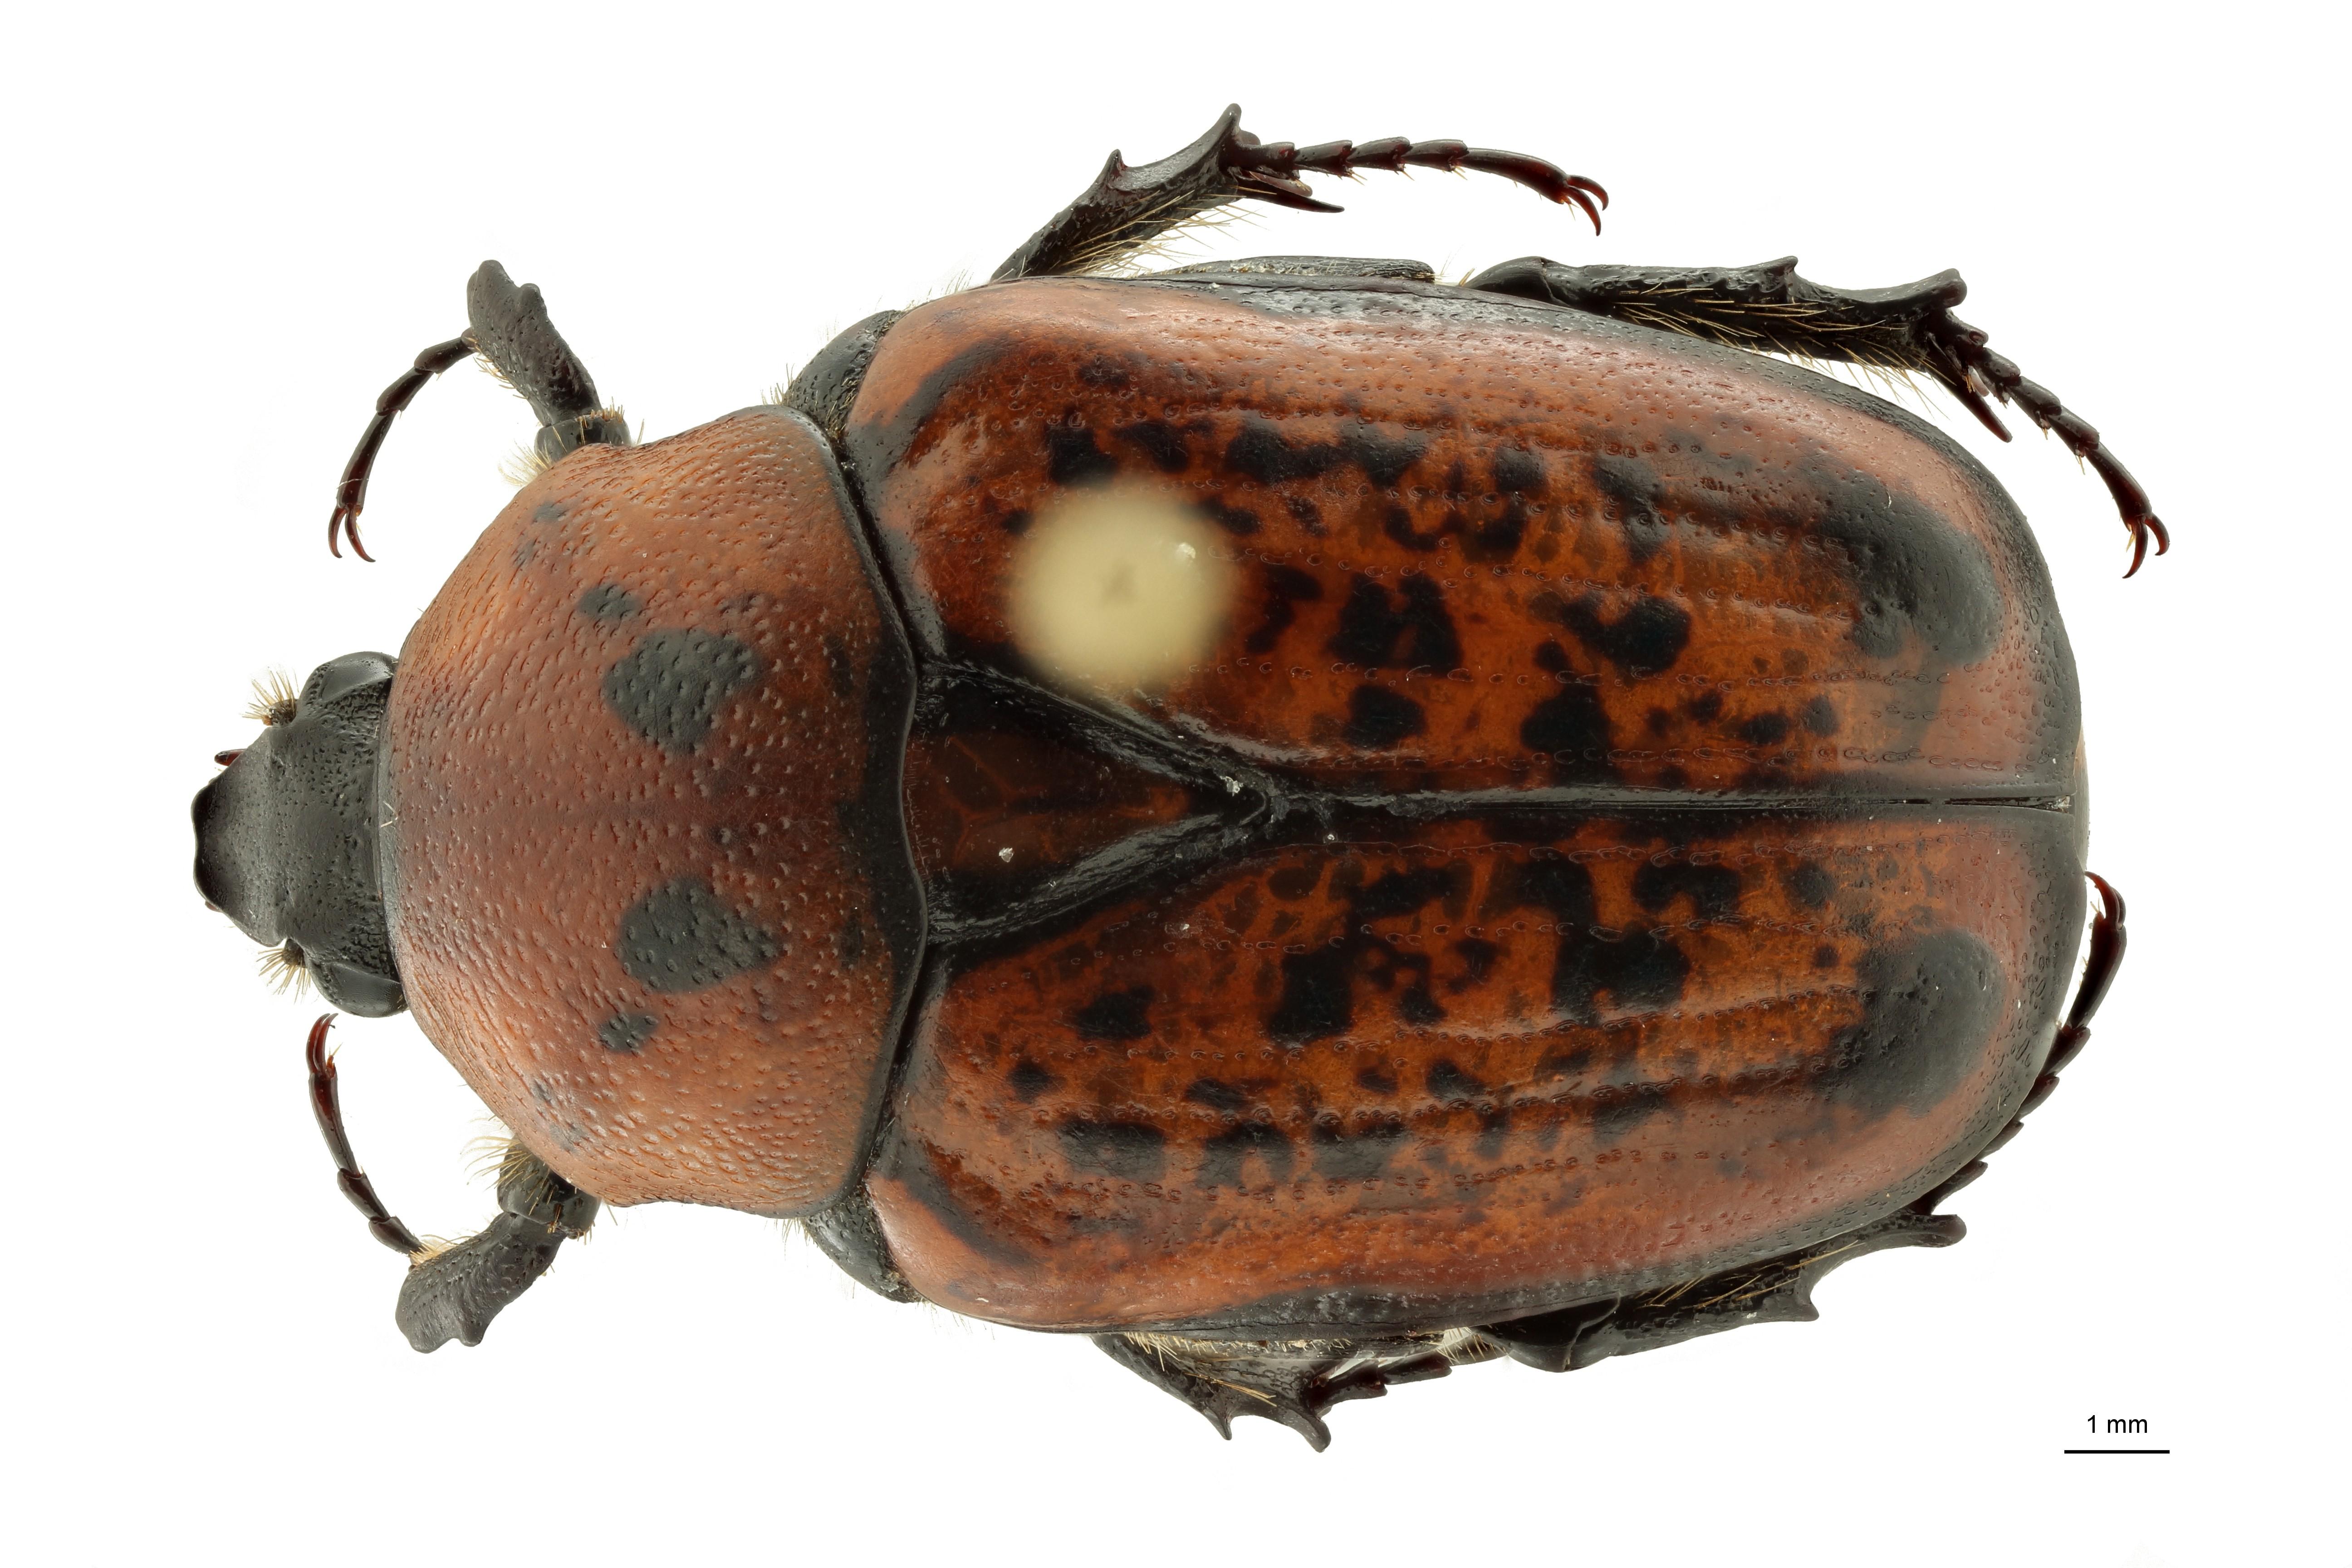 Anoplocheilus (Diplognathoides) werneri nt1 M D ZS PMax Scaled.jpeg